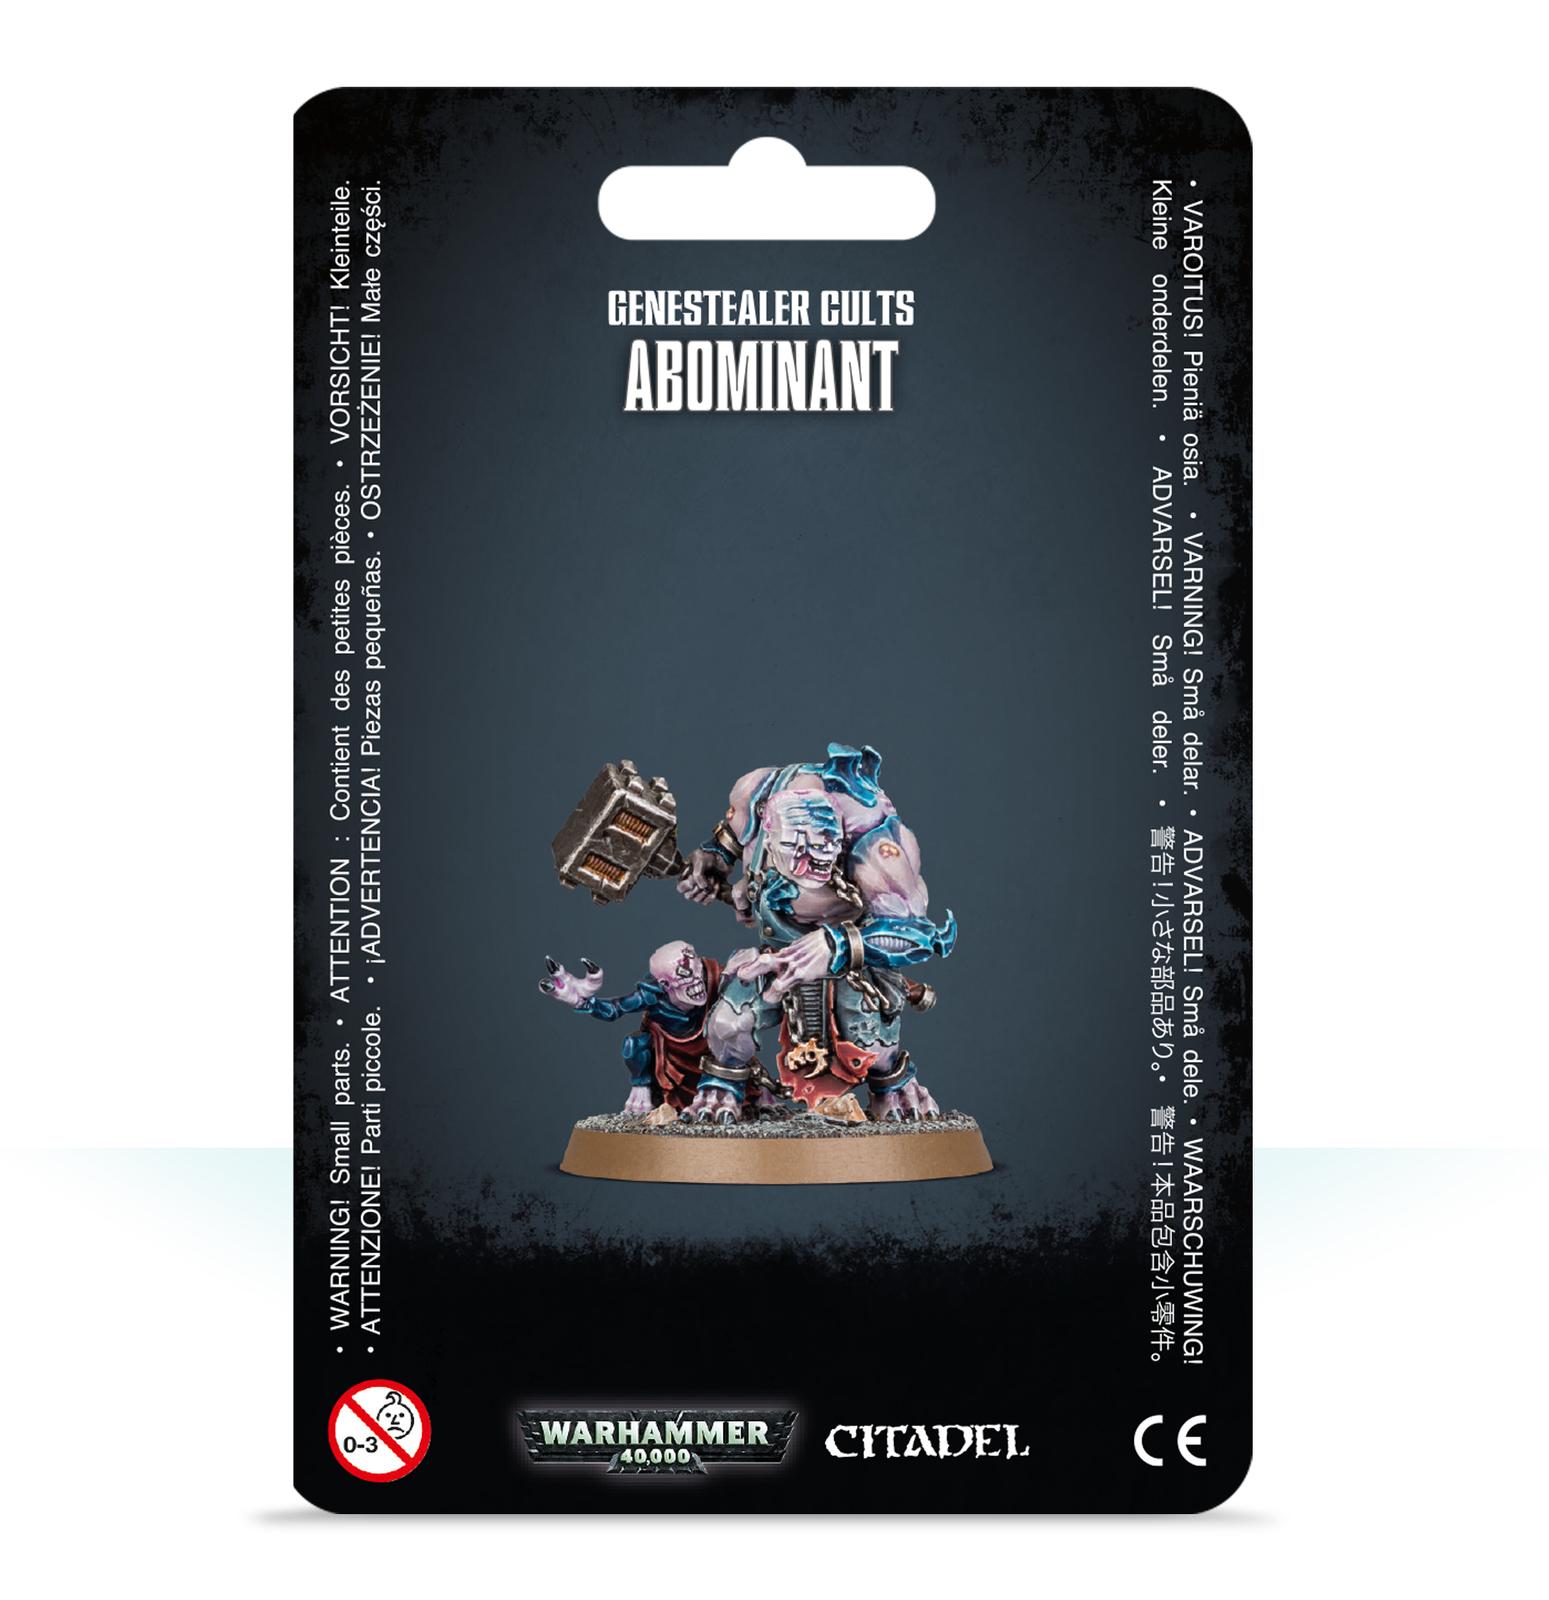 Warhammer 40,000 Genestealer Cults Abominant image